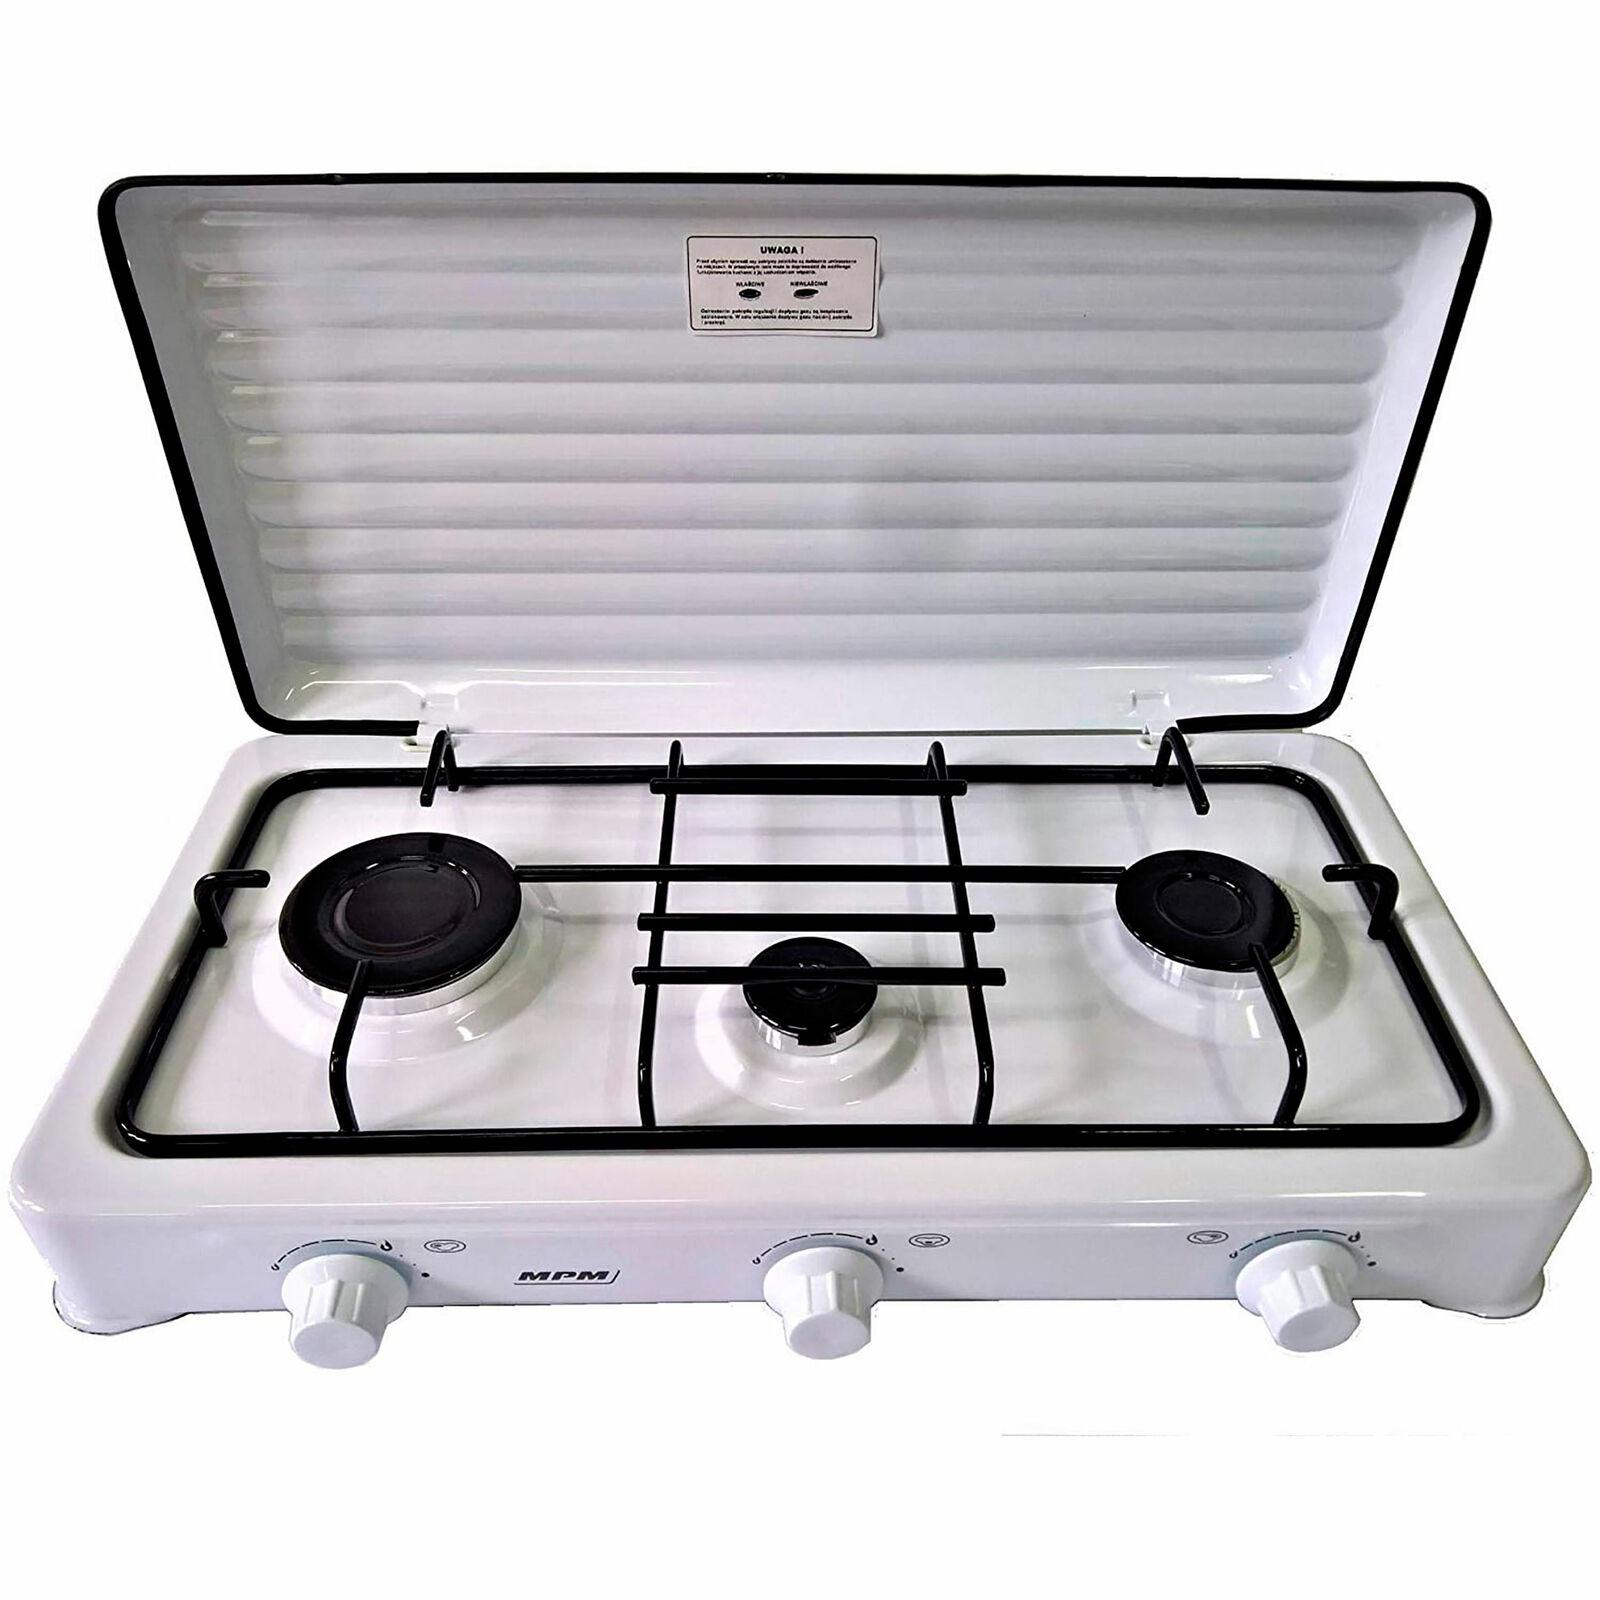 s l1600 - Cocina de Gas Portátil para camping 3 quemadores Blanca SMILE KN-03/1KB